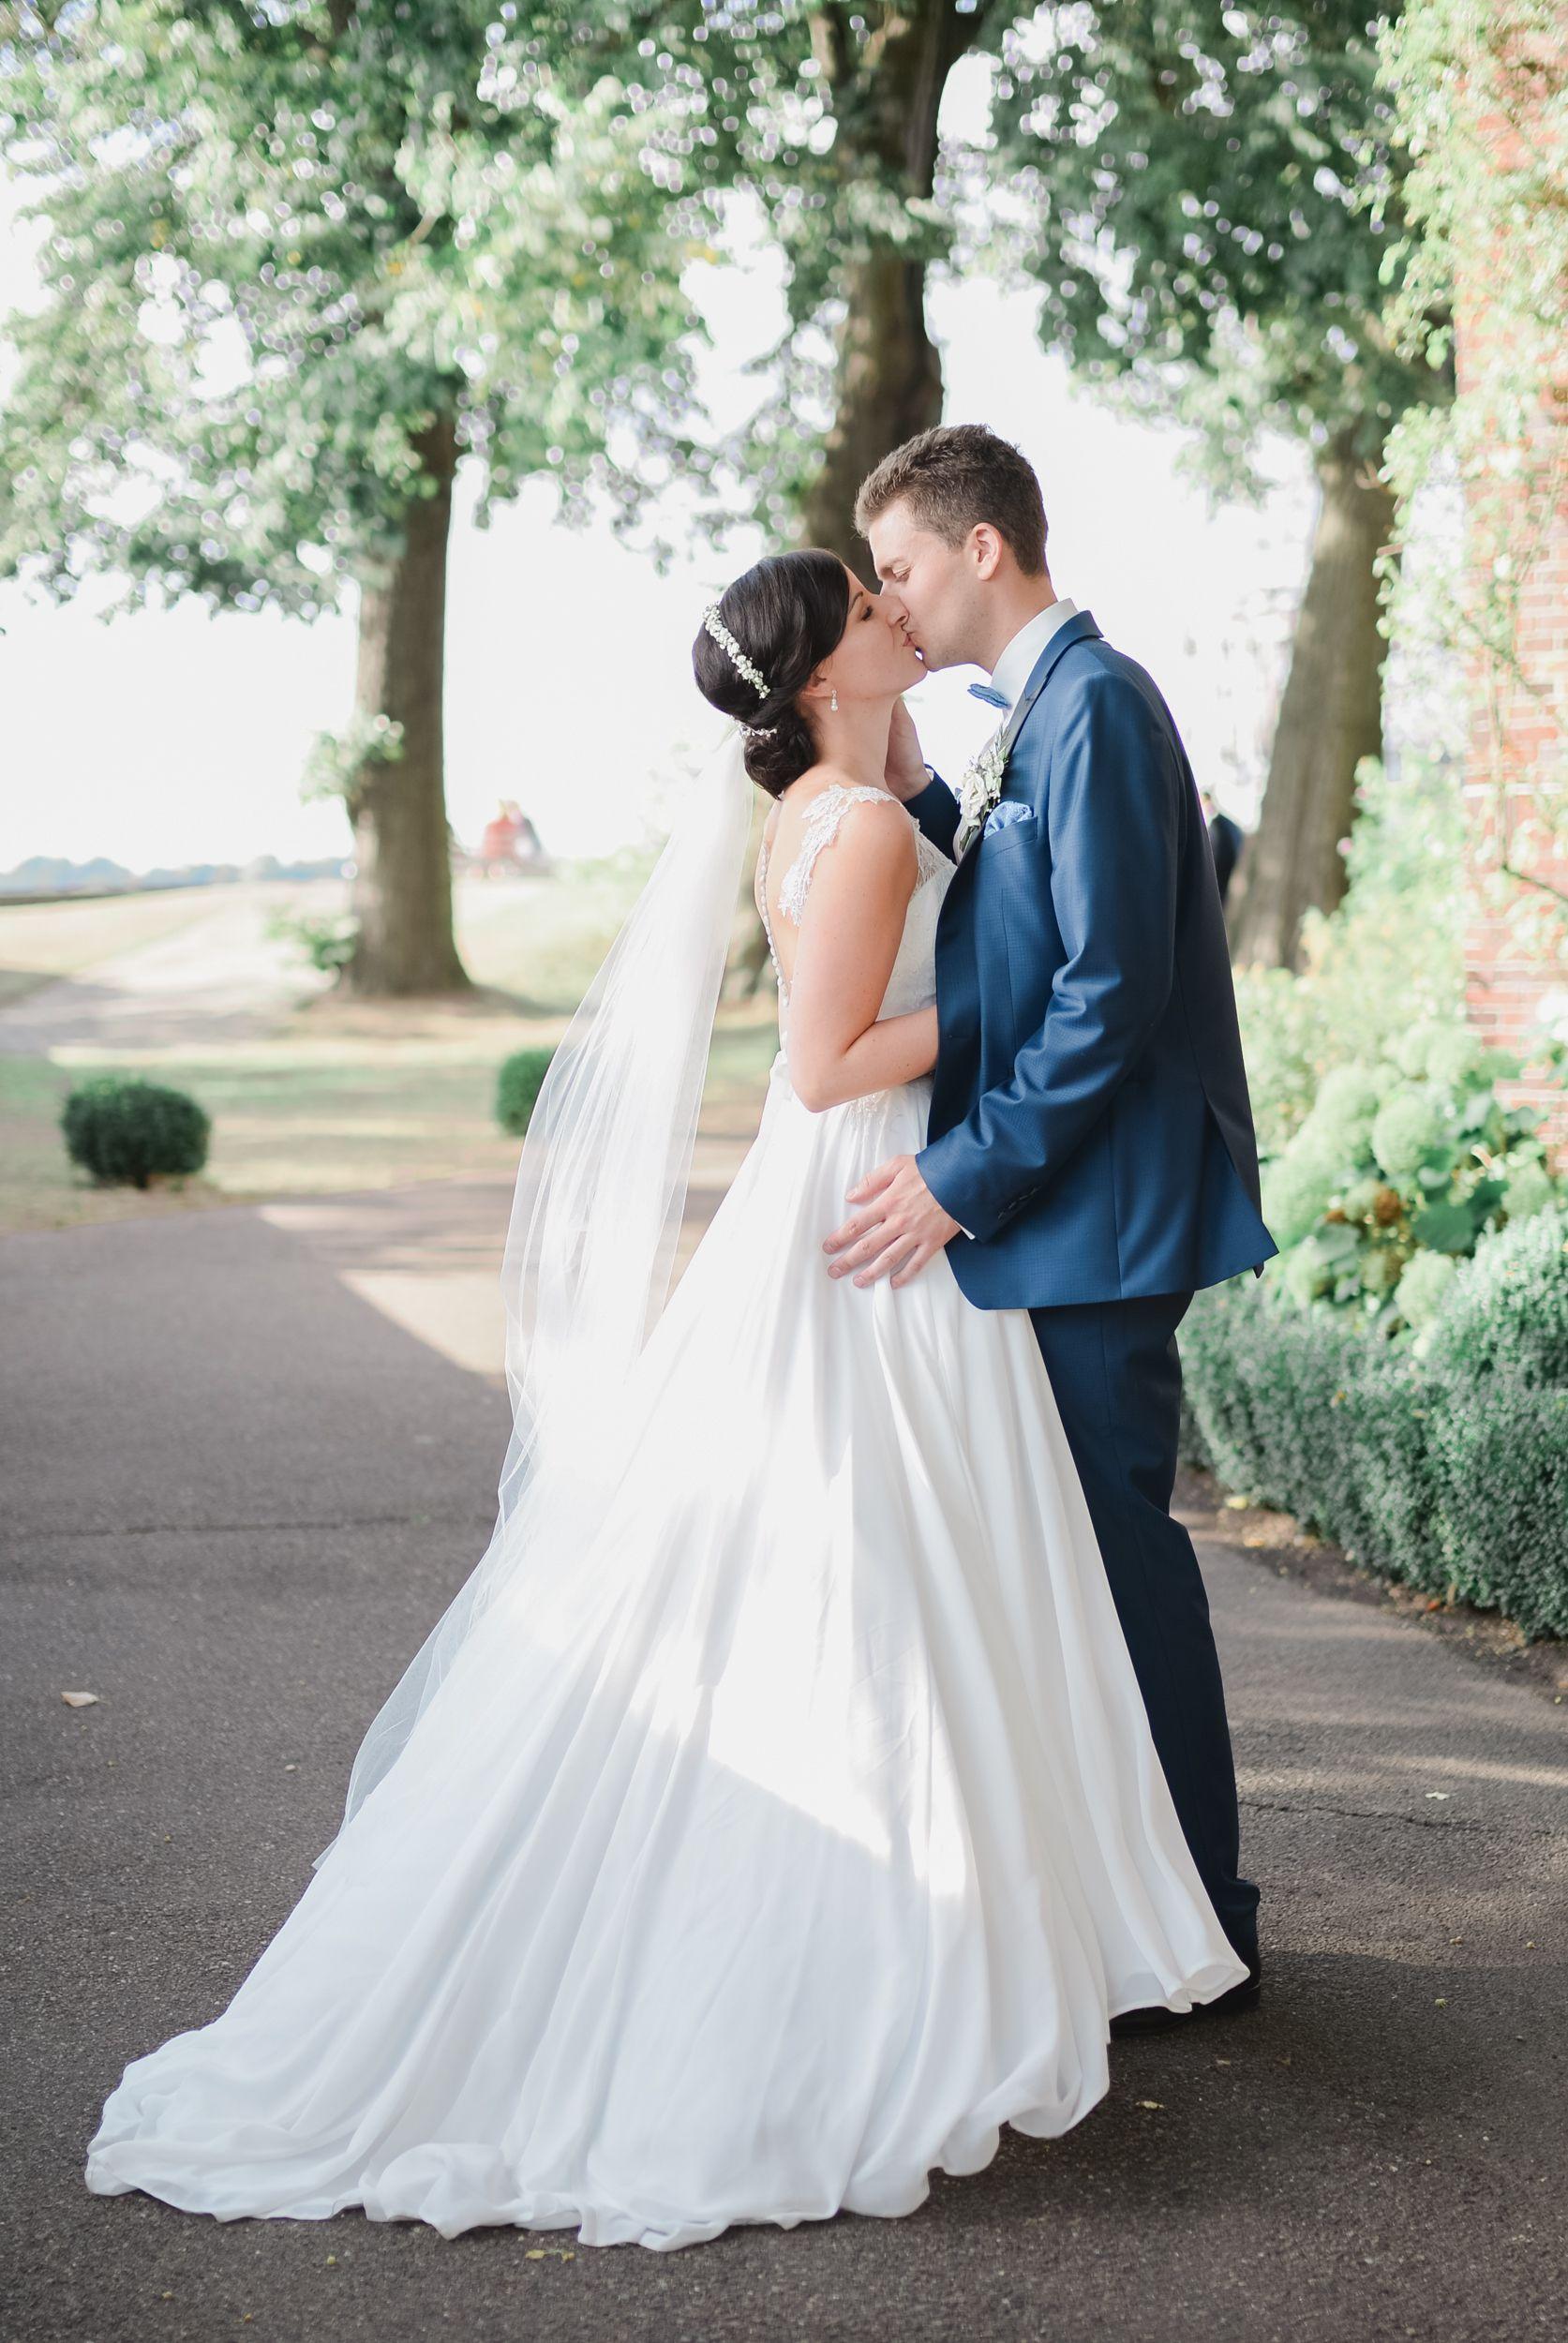 Best Of Weddings Anma Koy Photography Fine Art Weddings Fotografie Hochzeitsfotograf Hochzeit